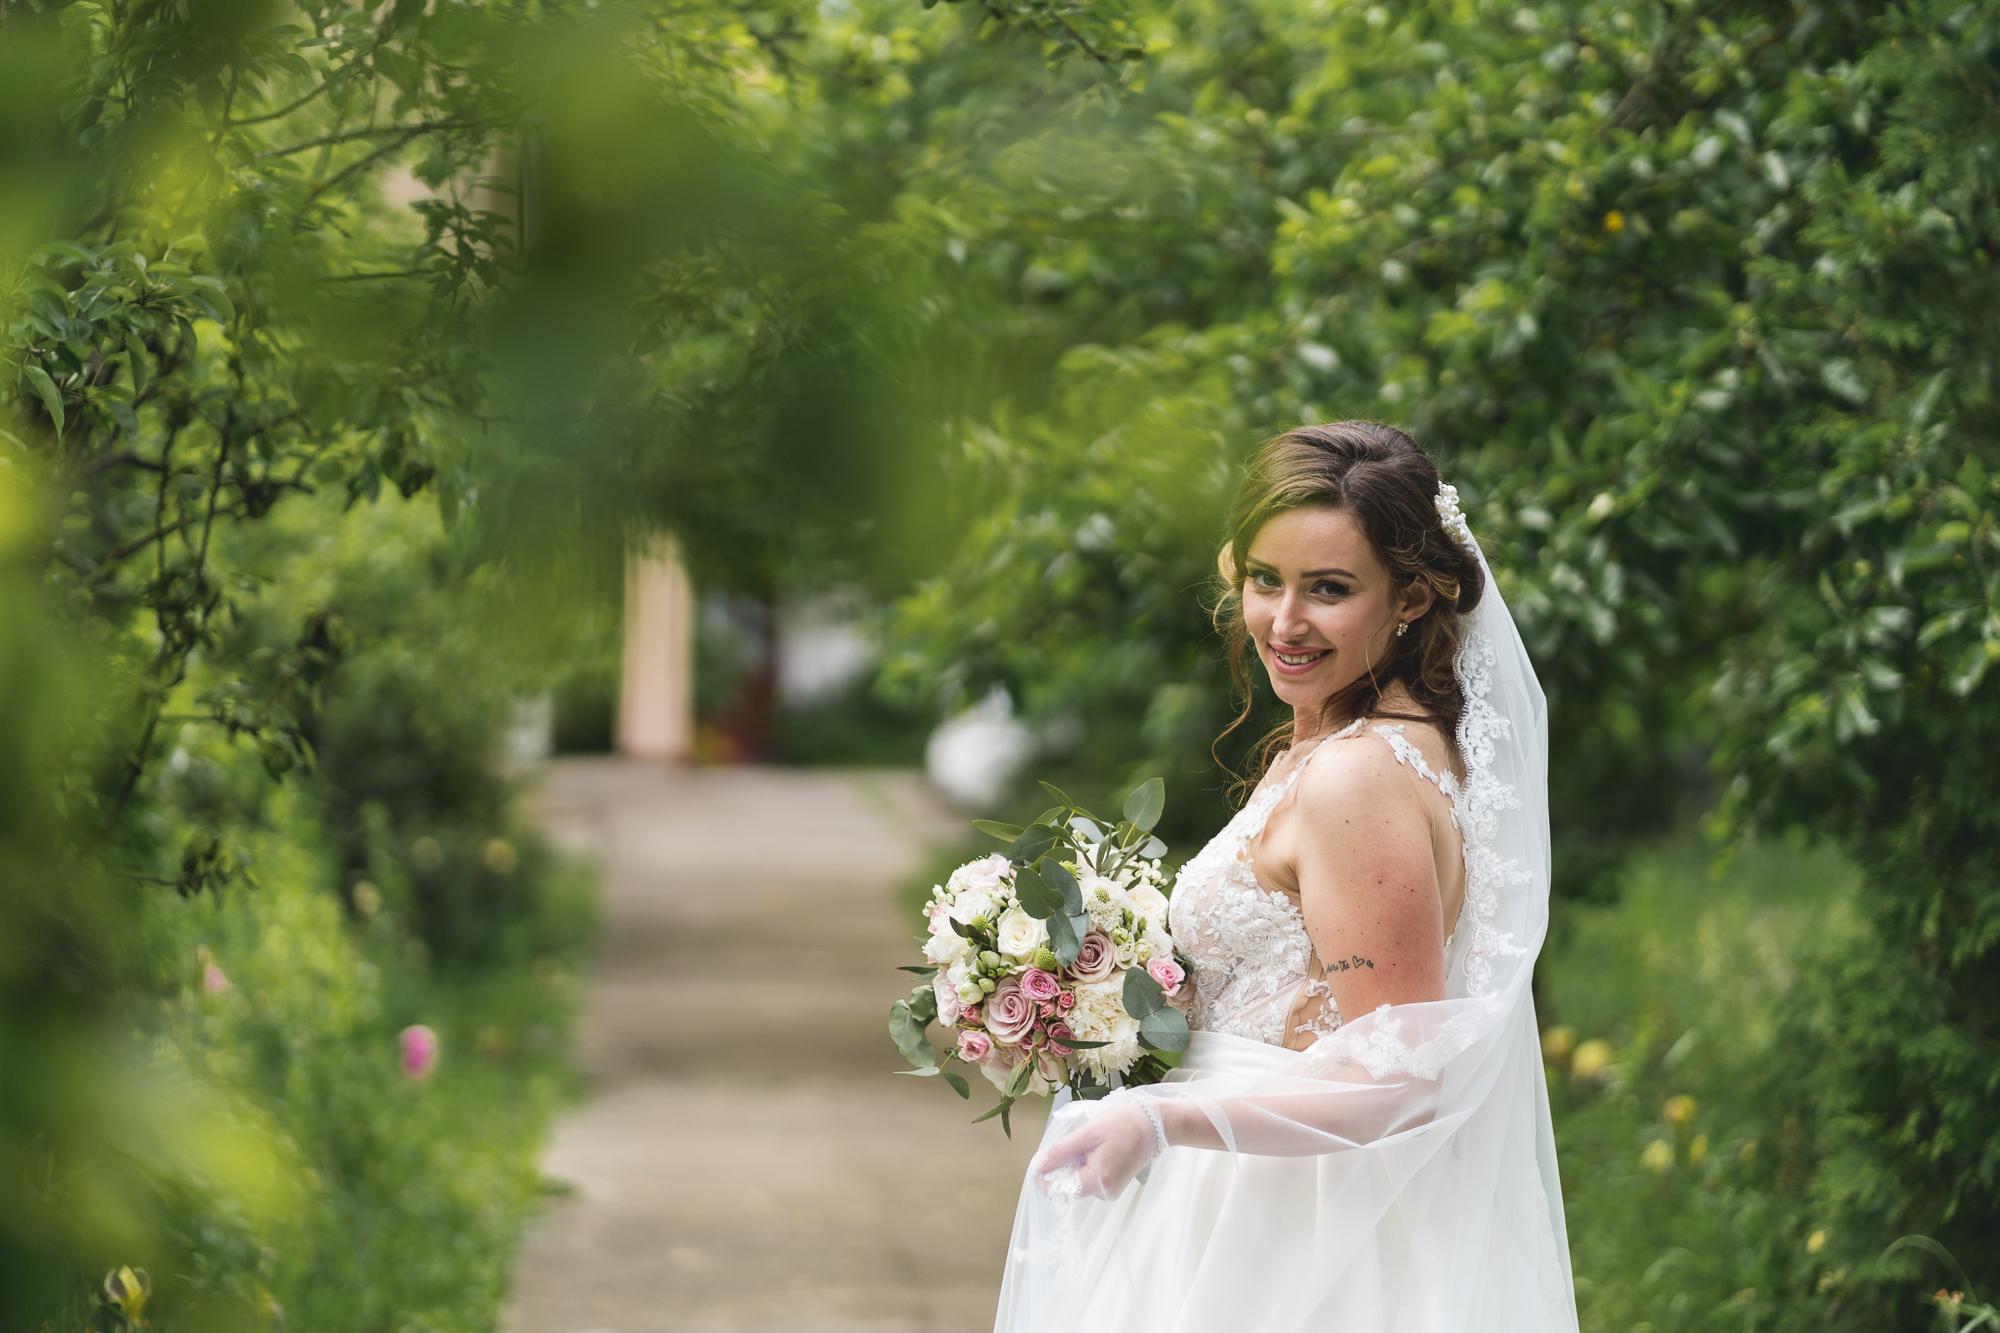 fotografie de nunta, portret de mireasa, buchetul miresei in culoare roz pal cu mov,